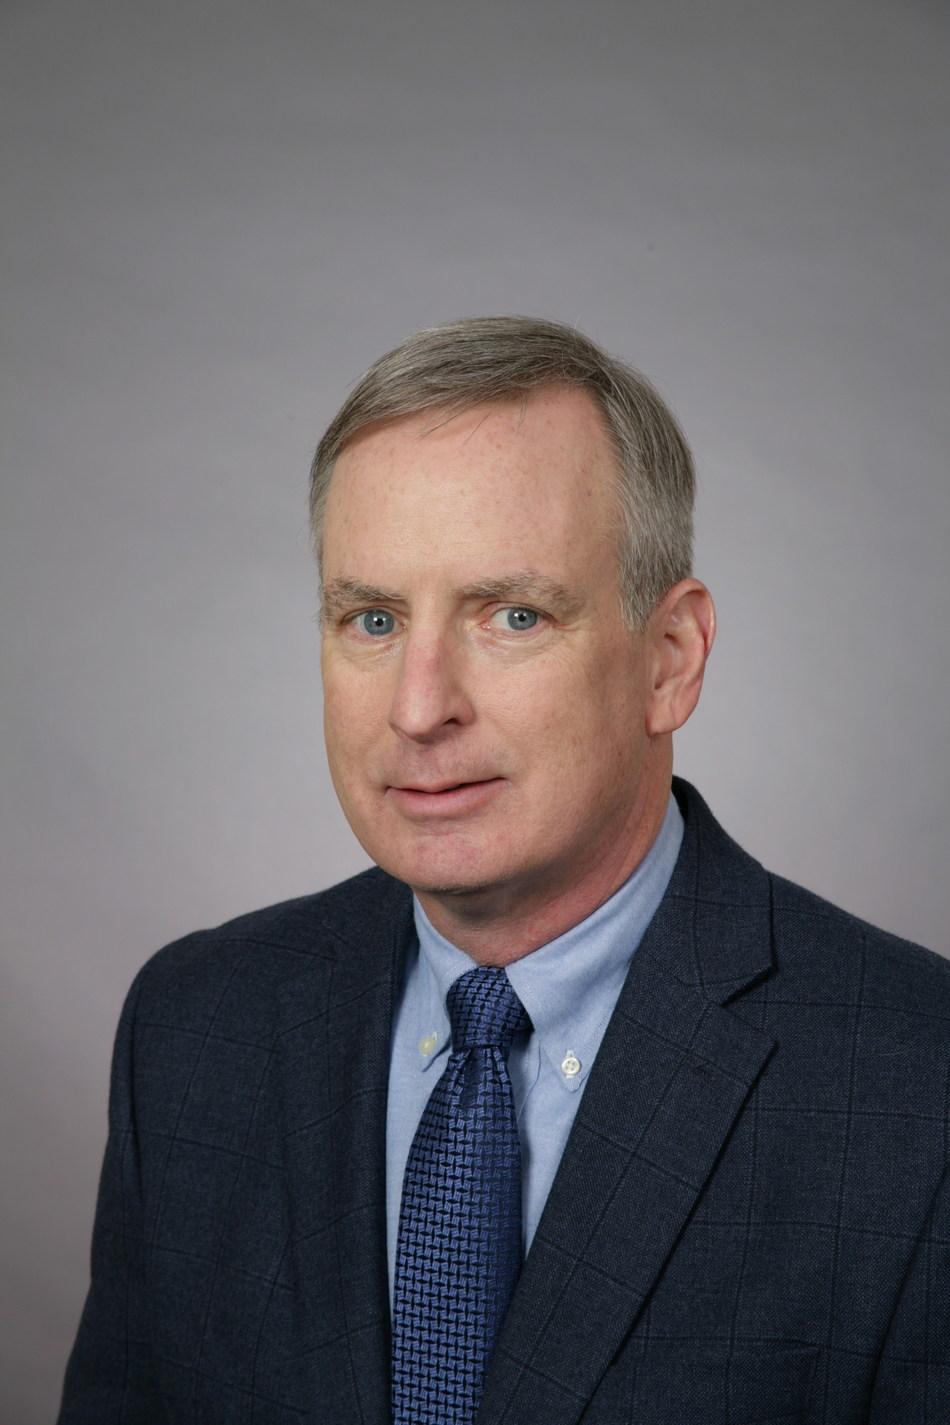 Kevin Carmody